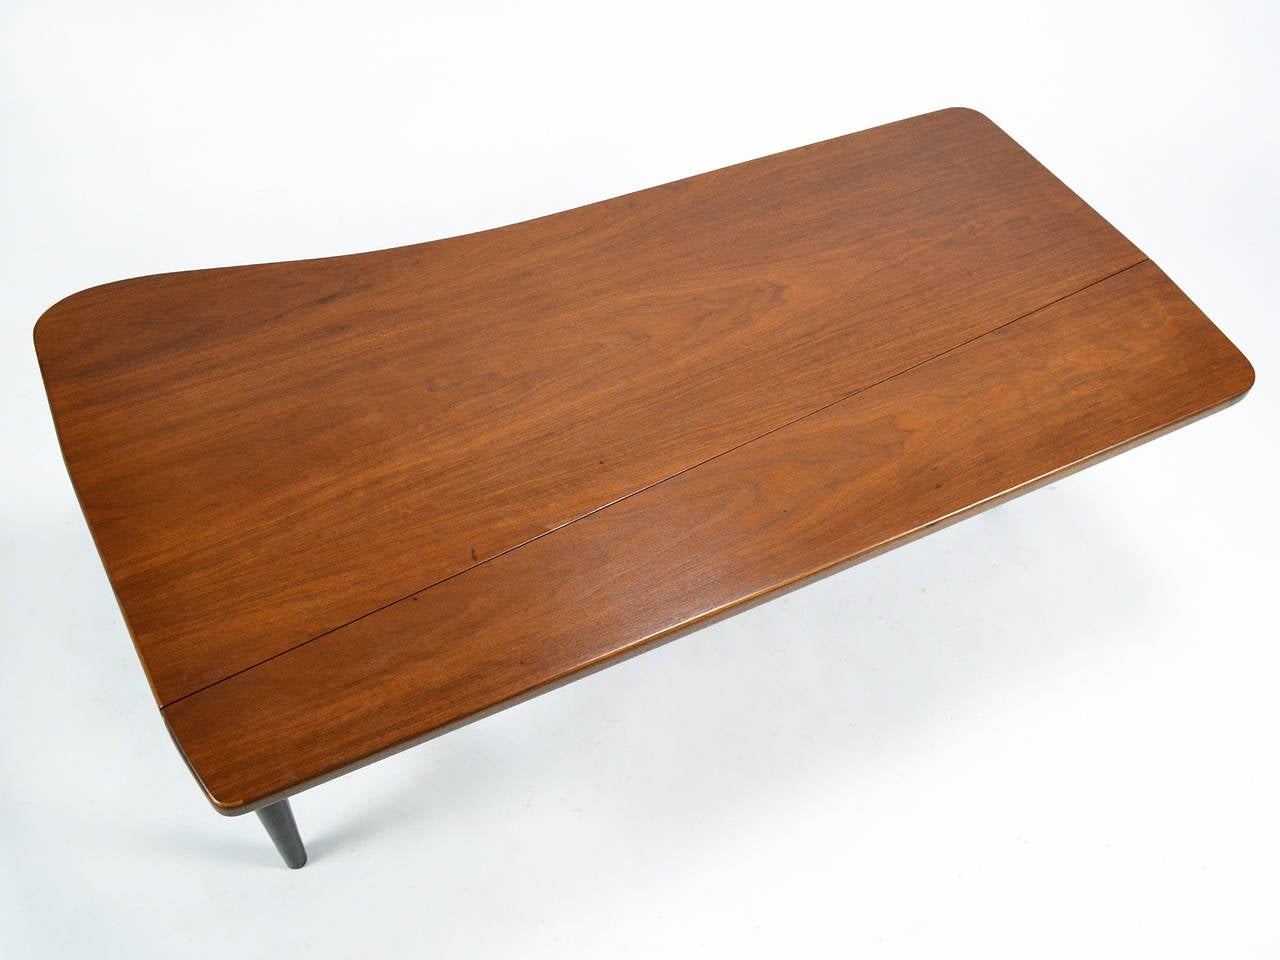 Walnut Finn Juhl Drop-Leaf Coffee Table For Sale